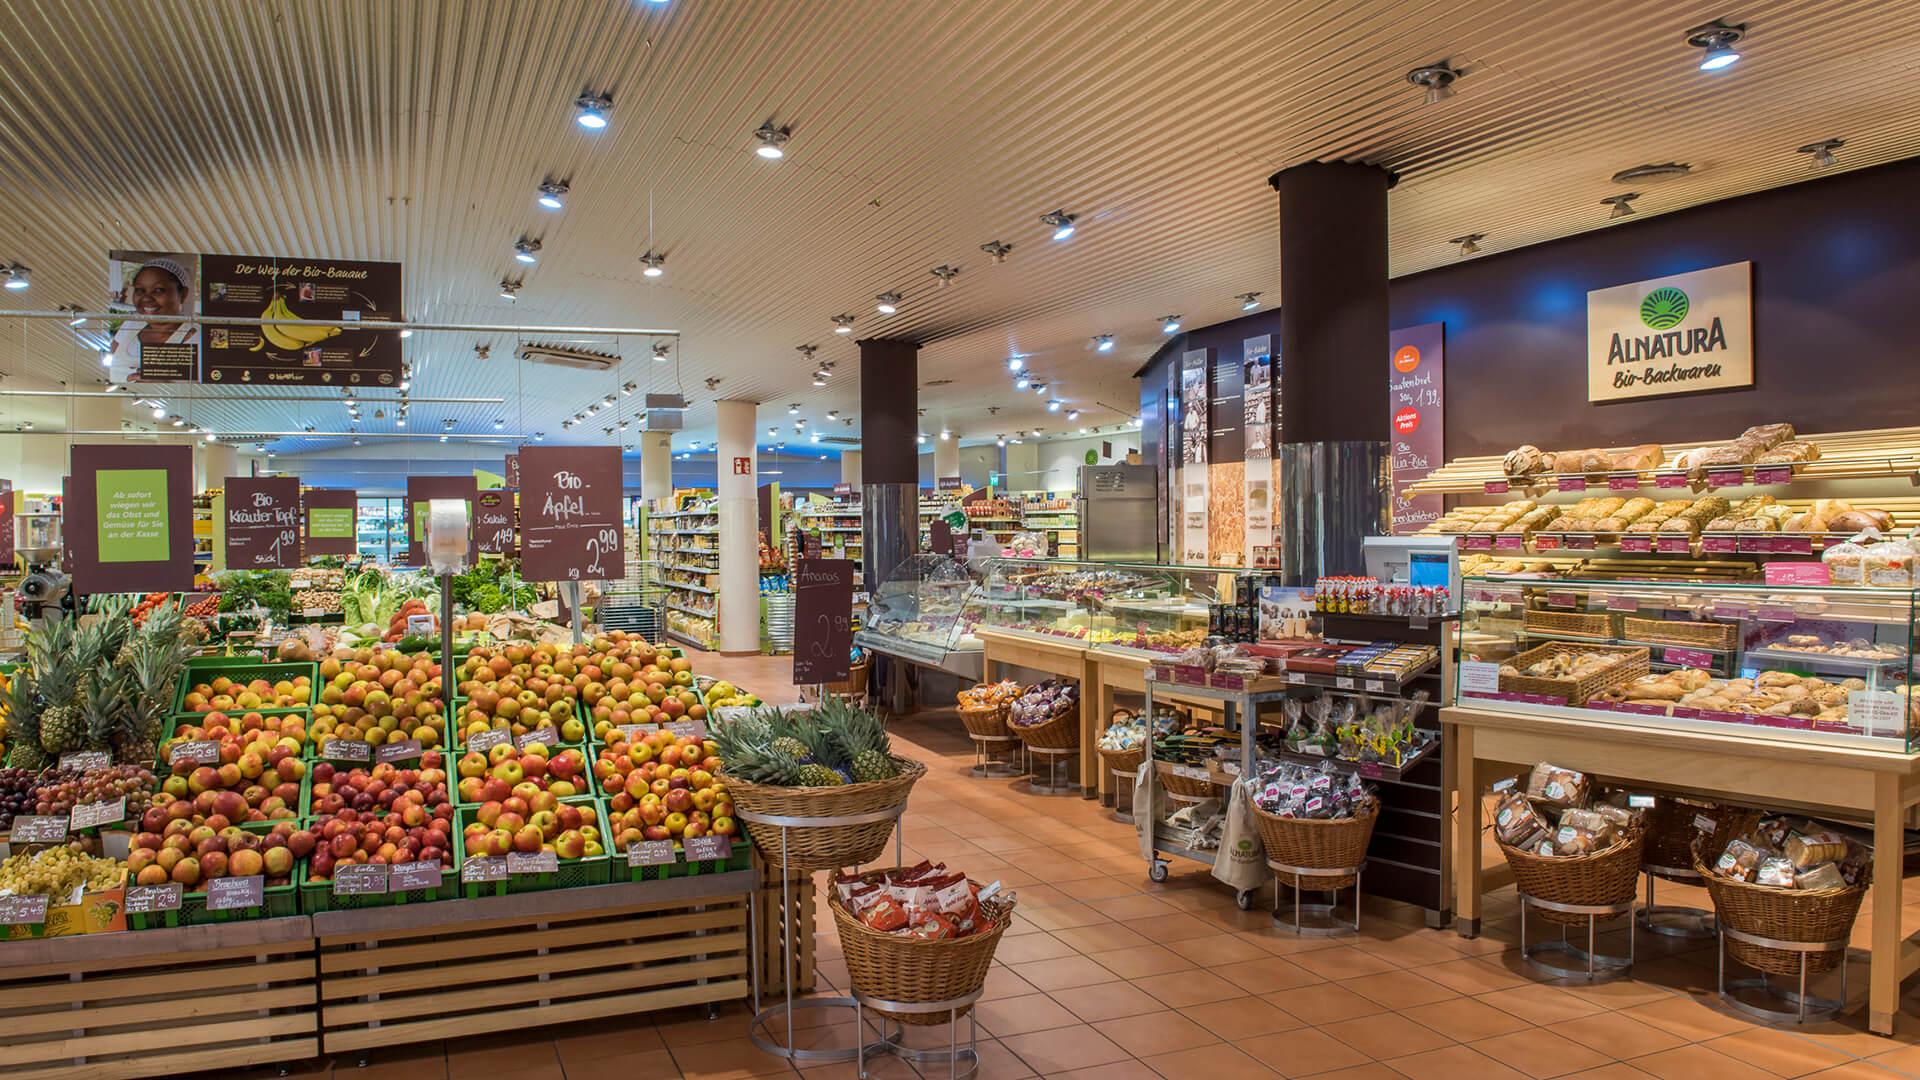 Alnatura supermarket interior view